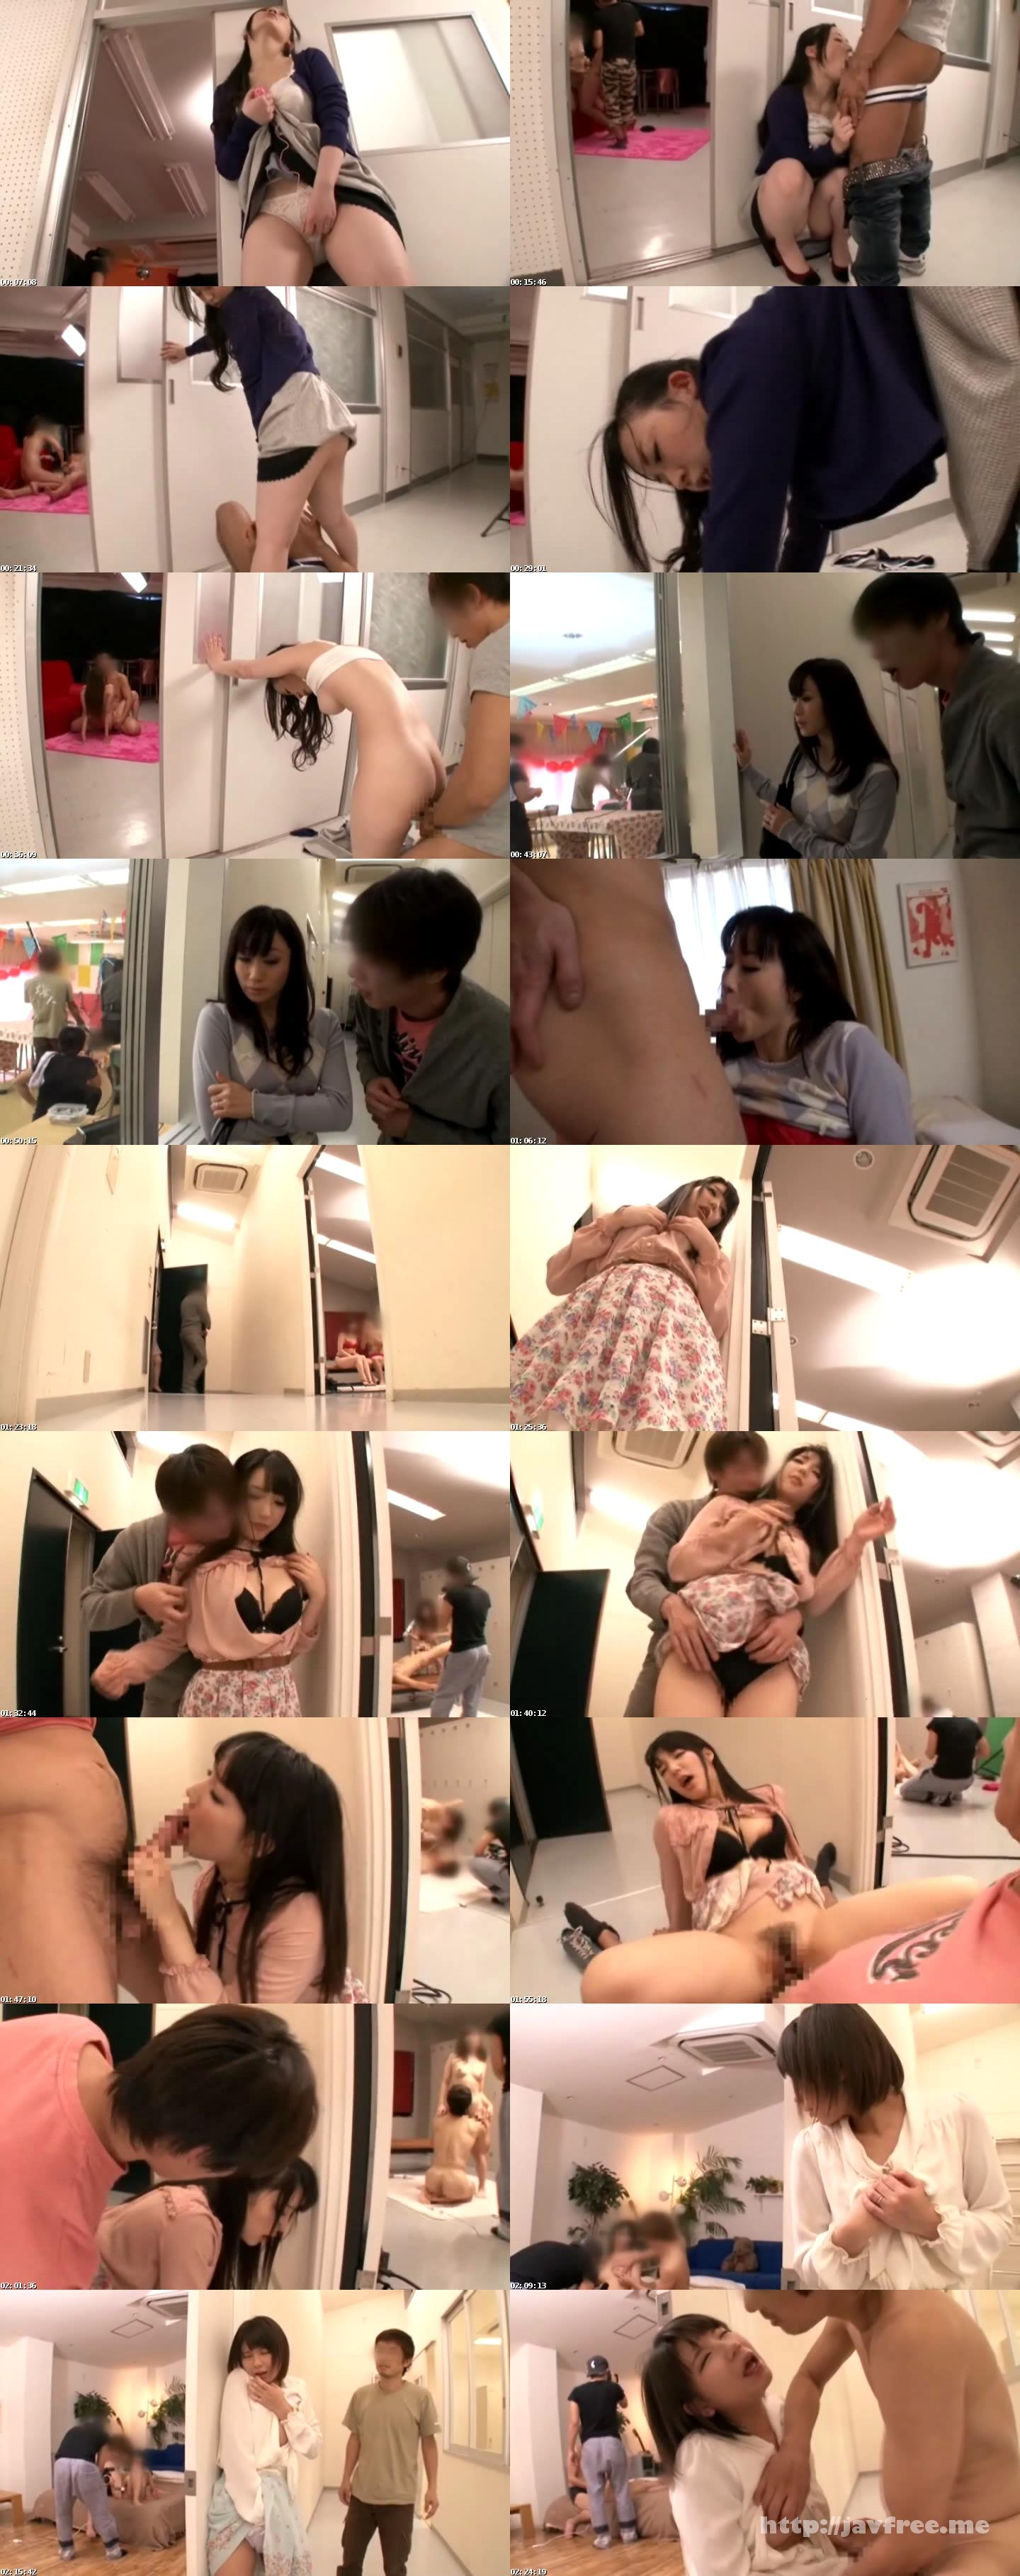 [SCOP 225] AV撮影現場を見学して疼いた若妻はどんな男のチ●ポも受け入れる!? SCOP